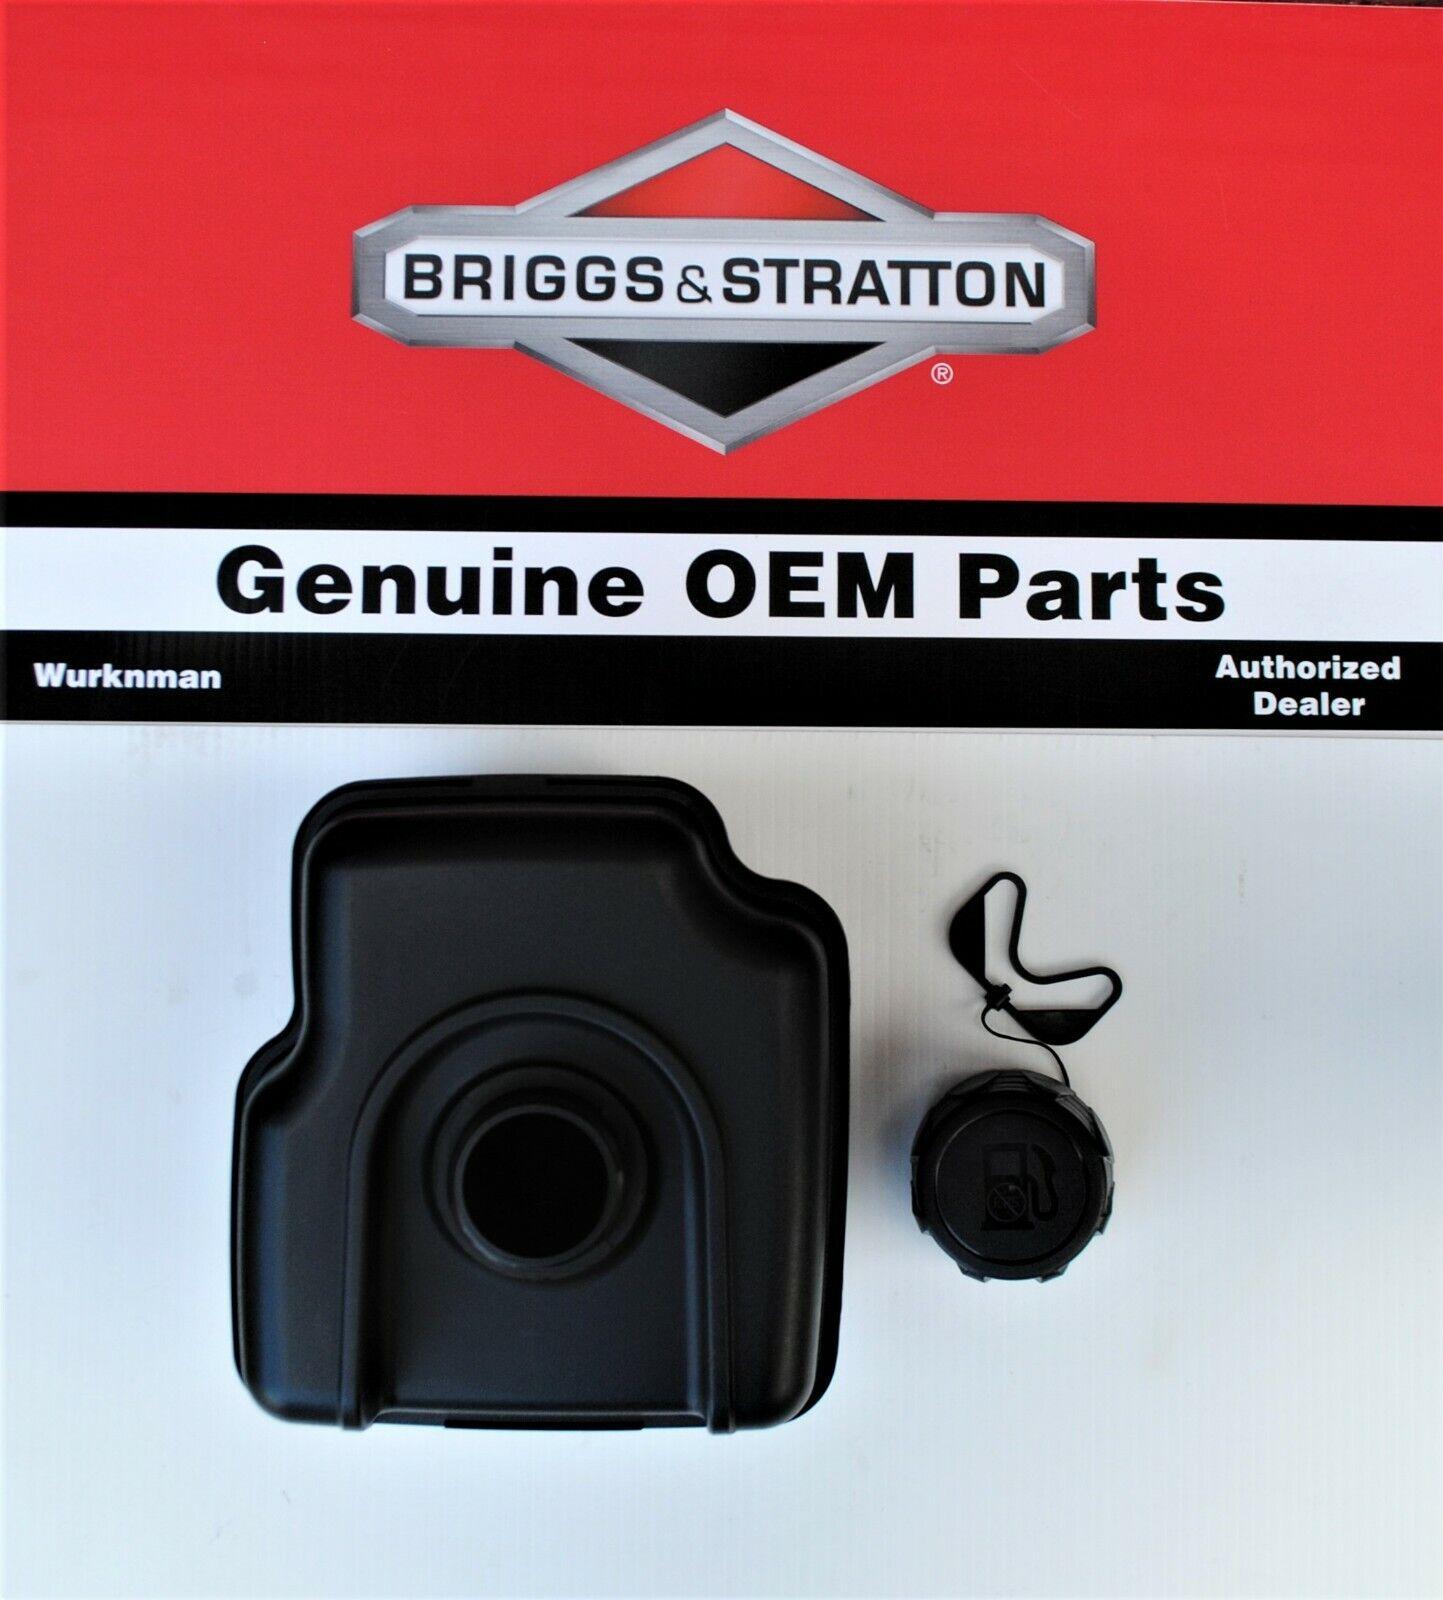 Genuine OEM Briggs Stratton 799863 Tanque de Combustible Reemplaza & 694260, 698110, 695736